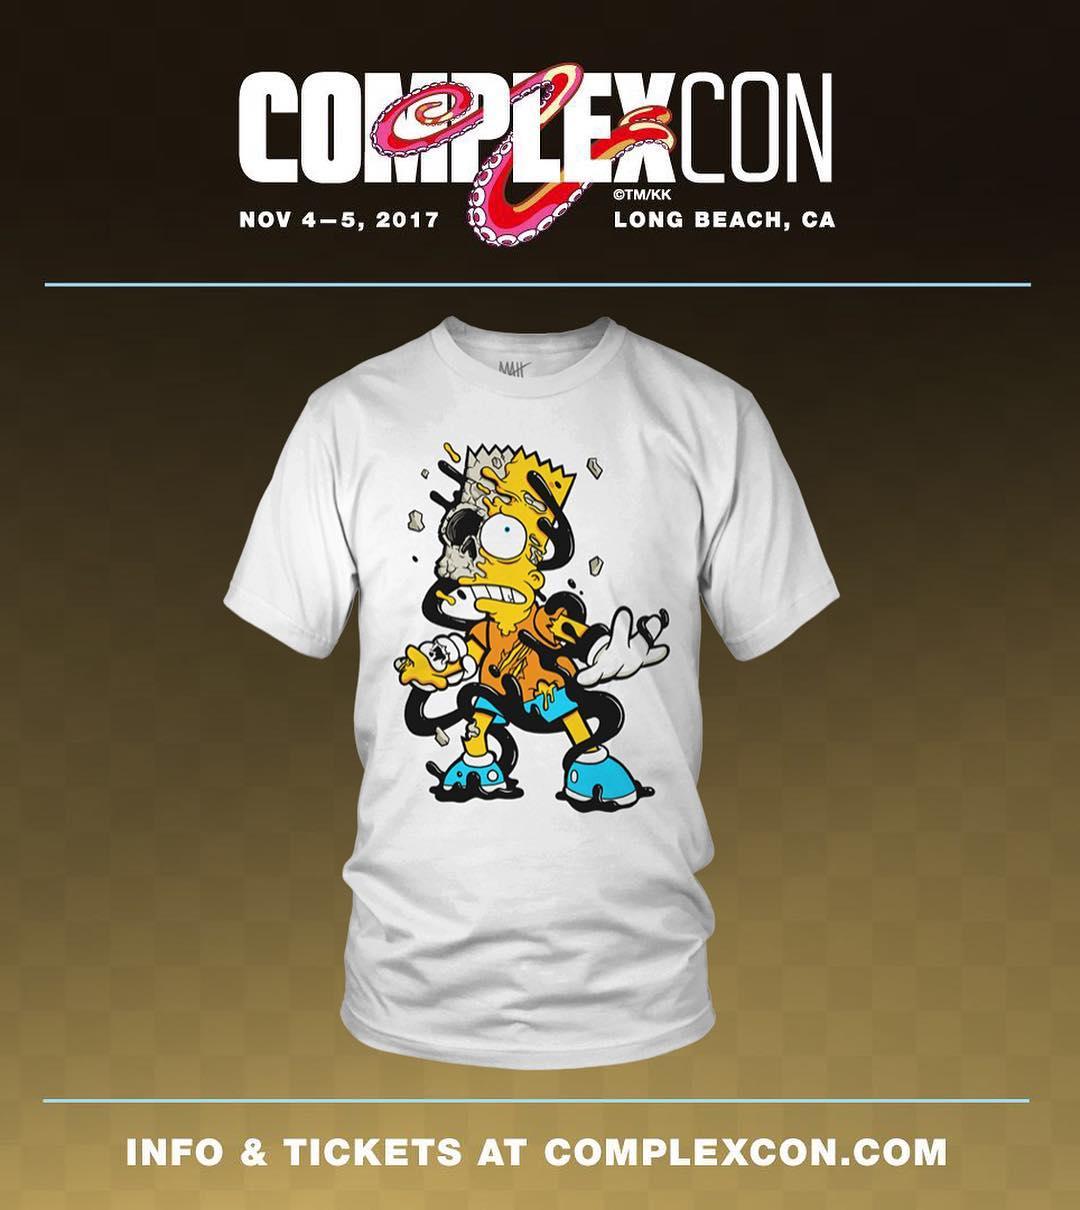 Matt Gondek Deconstructed Marvin Martian Tee Shirt L Large XL XLarge Edition 100